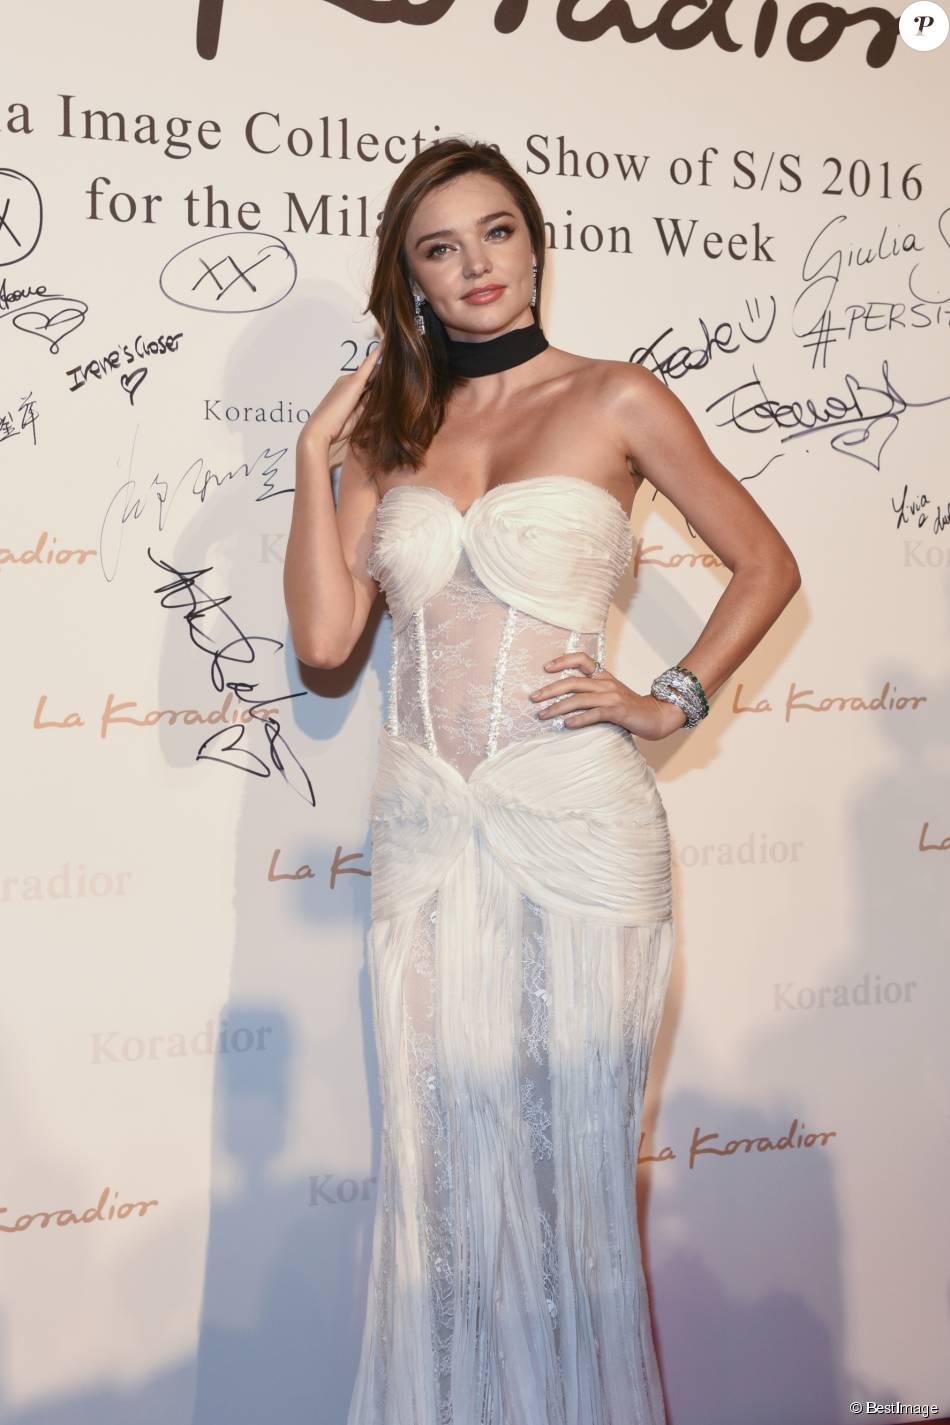 Miranda Kerr - Miranda Kerr au défilé de mode La Koriador printemps-été 2016 à Milan le 24 septembre 2015